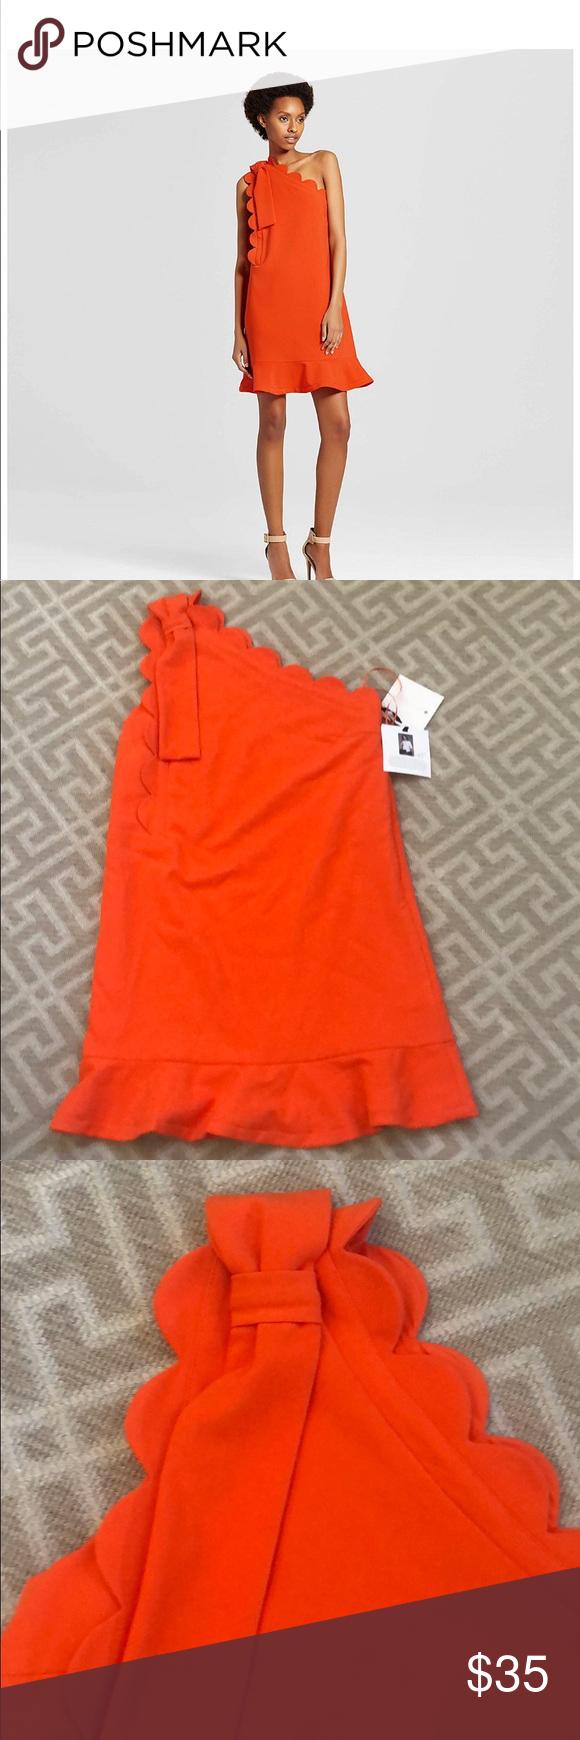 Nwt Victoria Bekham For Target Orange Dress Orange Dress Clothes Design Victoria Beckham Target [ 1740 x 580 Pixel ]